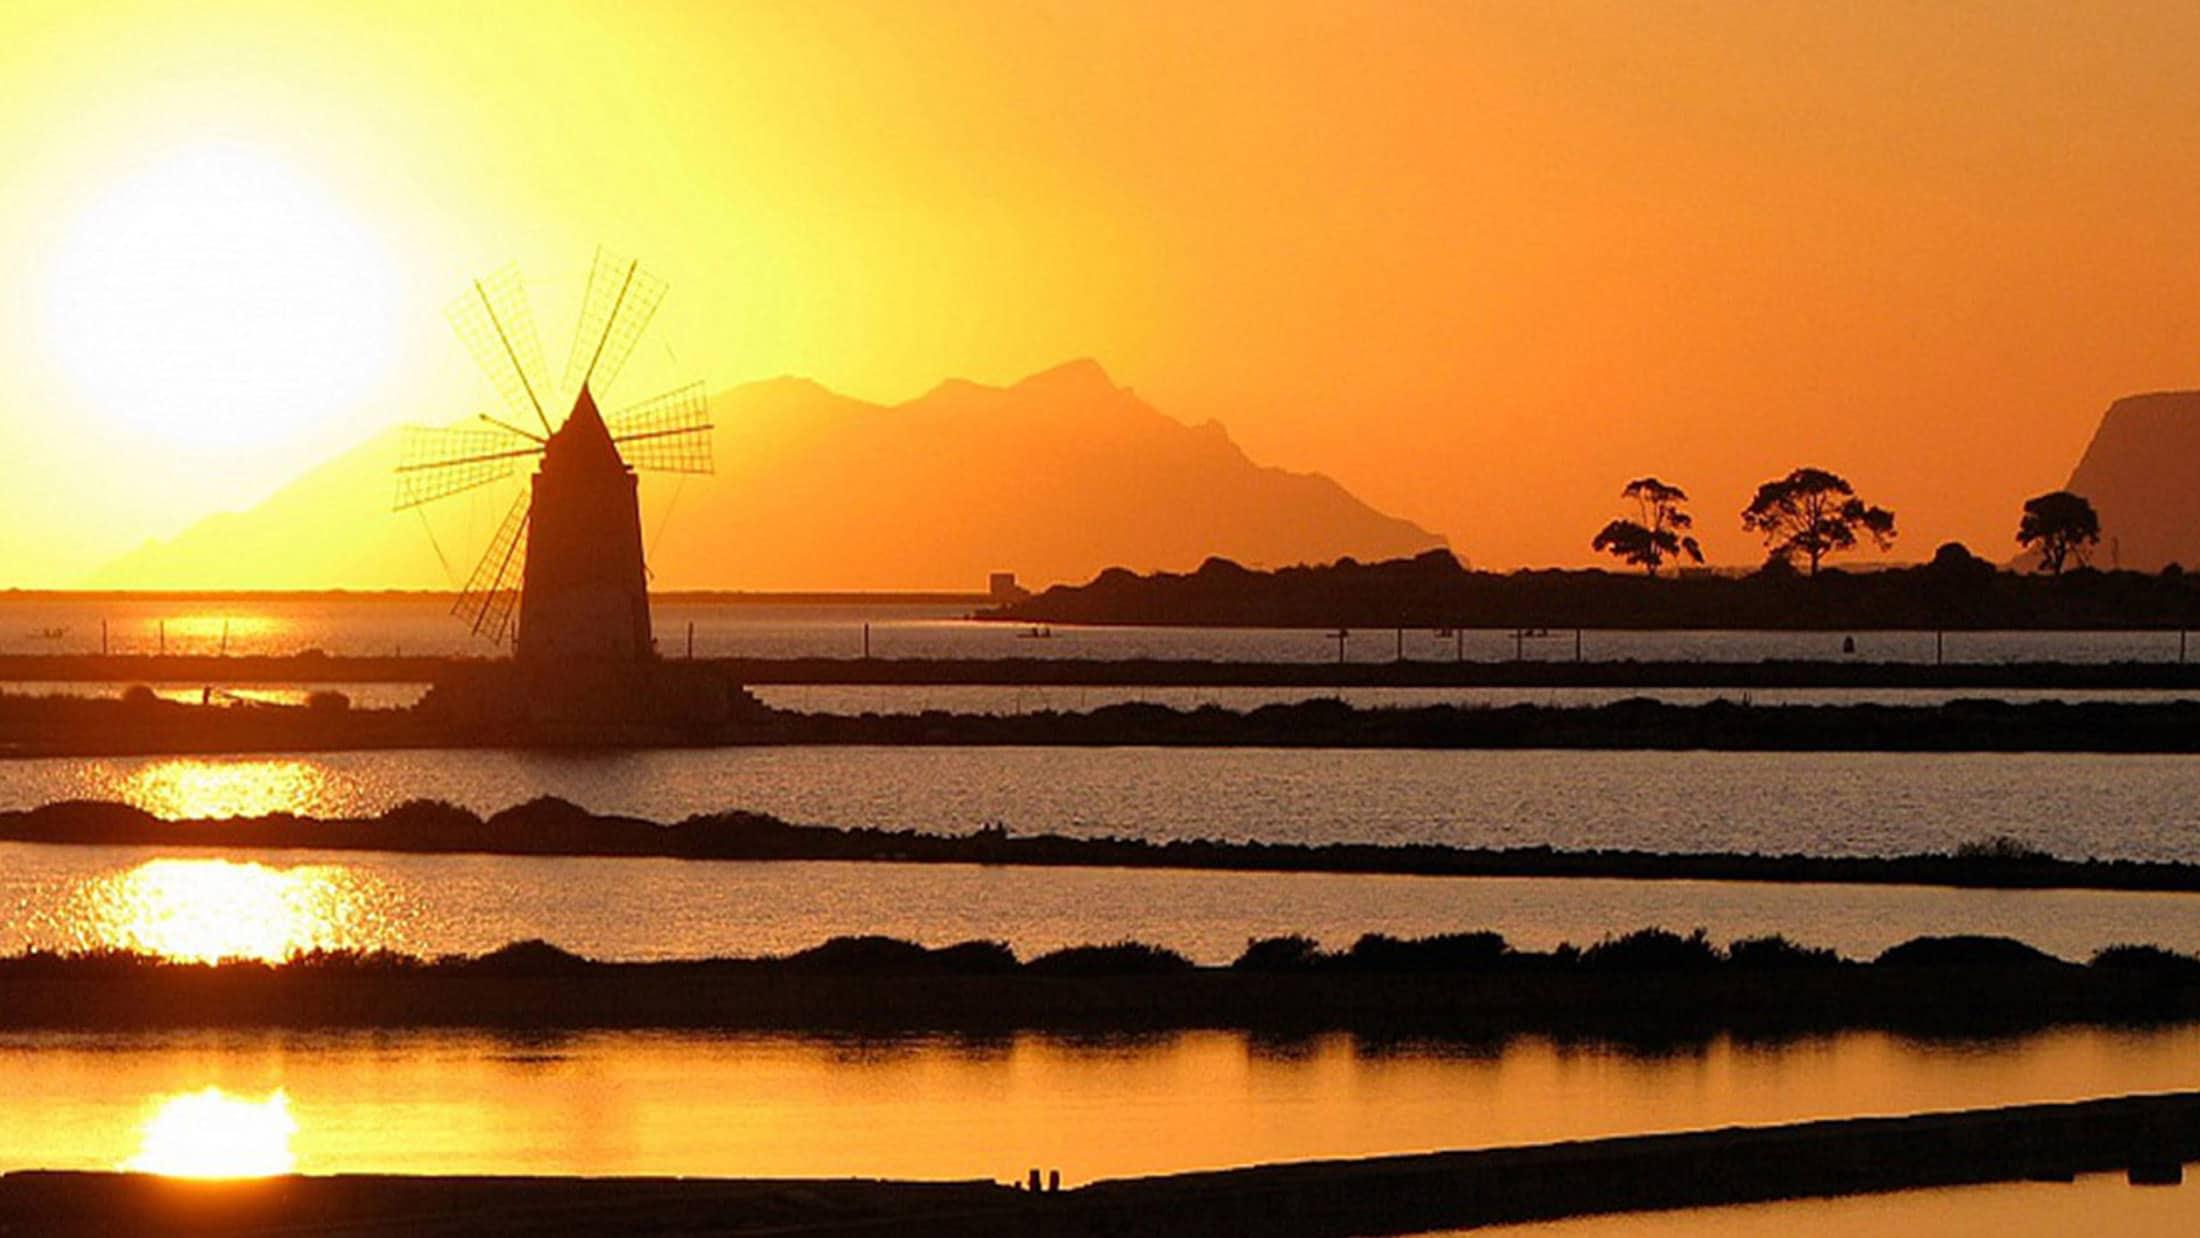 Lo-Stagnone-Lagoon-marsala-kitesurf-Sicily-Best-Spot-Kitesurfing-Sicilia-Flow-Kite-School-Cabrinha-duotone-kiteboarding-salina-sunset-trapani-salt